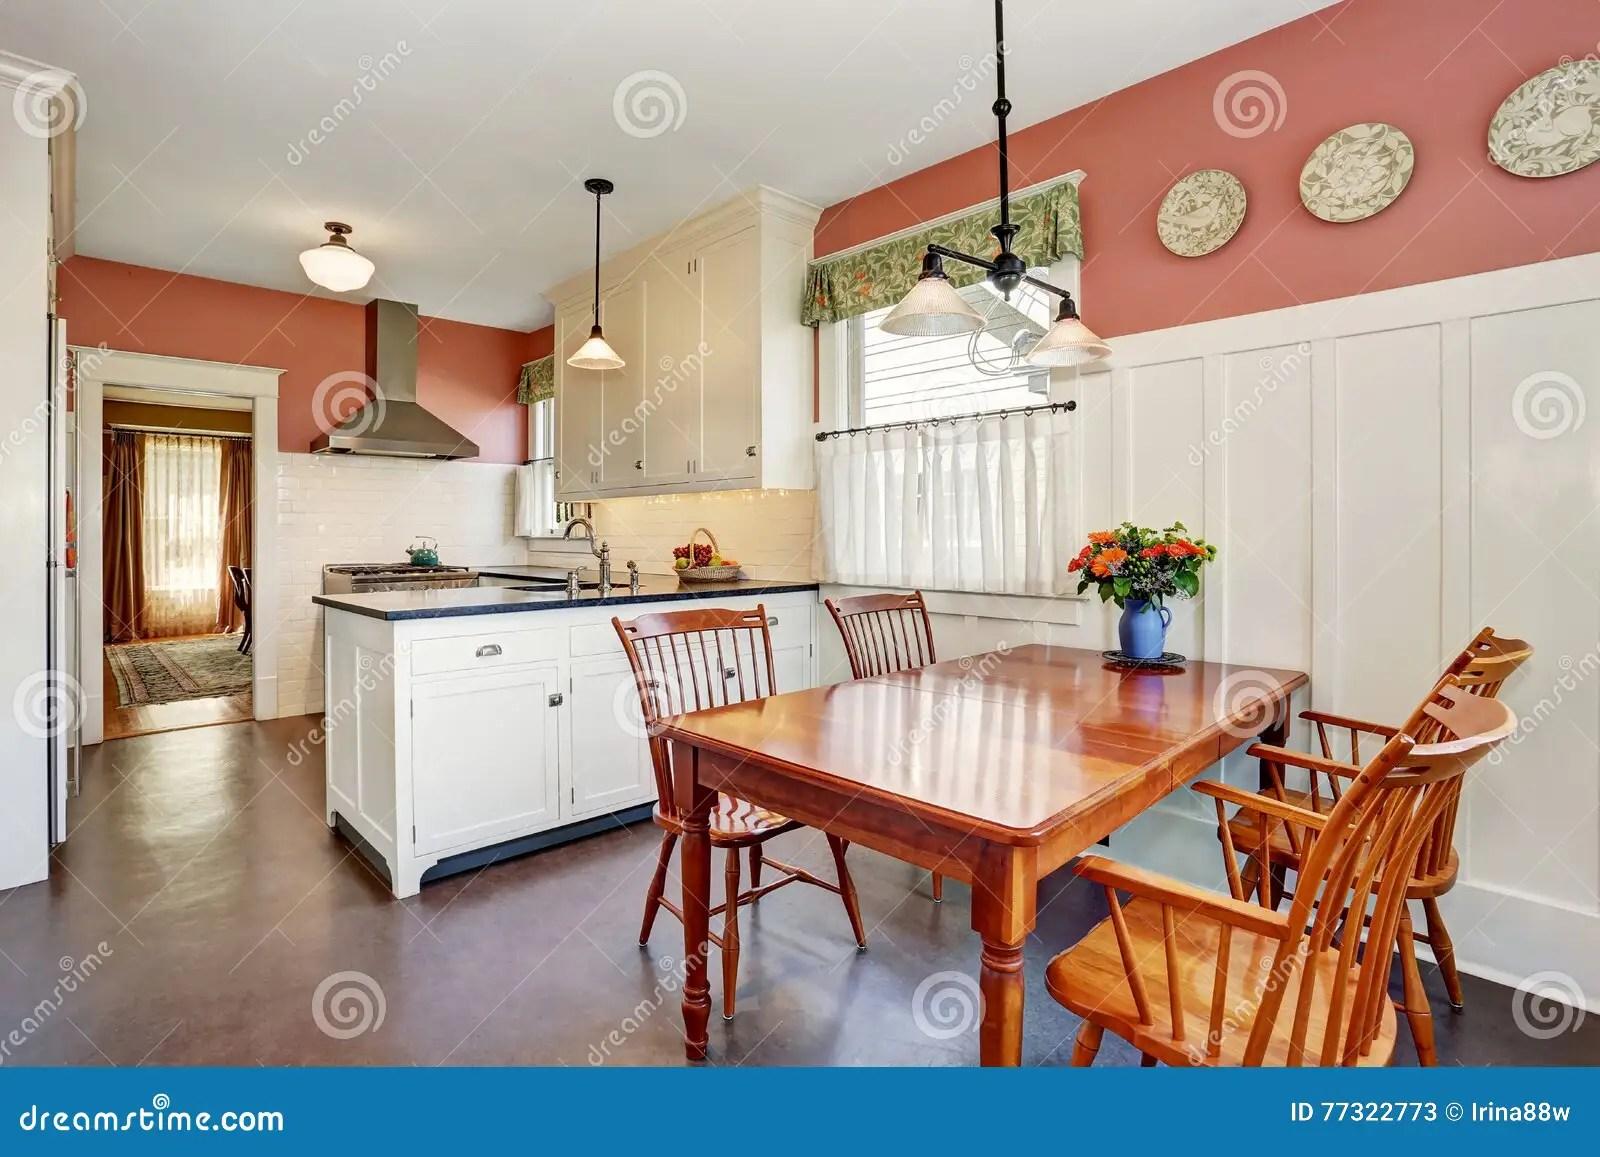 kitchen updates new design 有白色内阁 花岗岩桌面和硬木地板的经典厨房室库存图片 图片包括有典雅 与白色内阁 花岗岩桌面和硬木地板的经典厨房室内部并且红色墙壁西北 美国